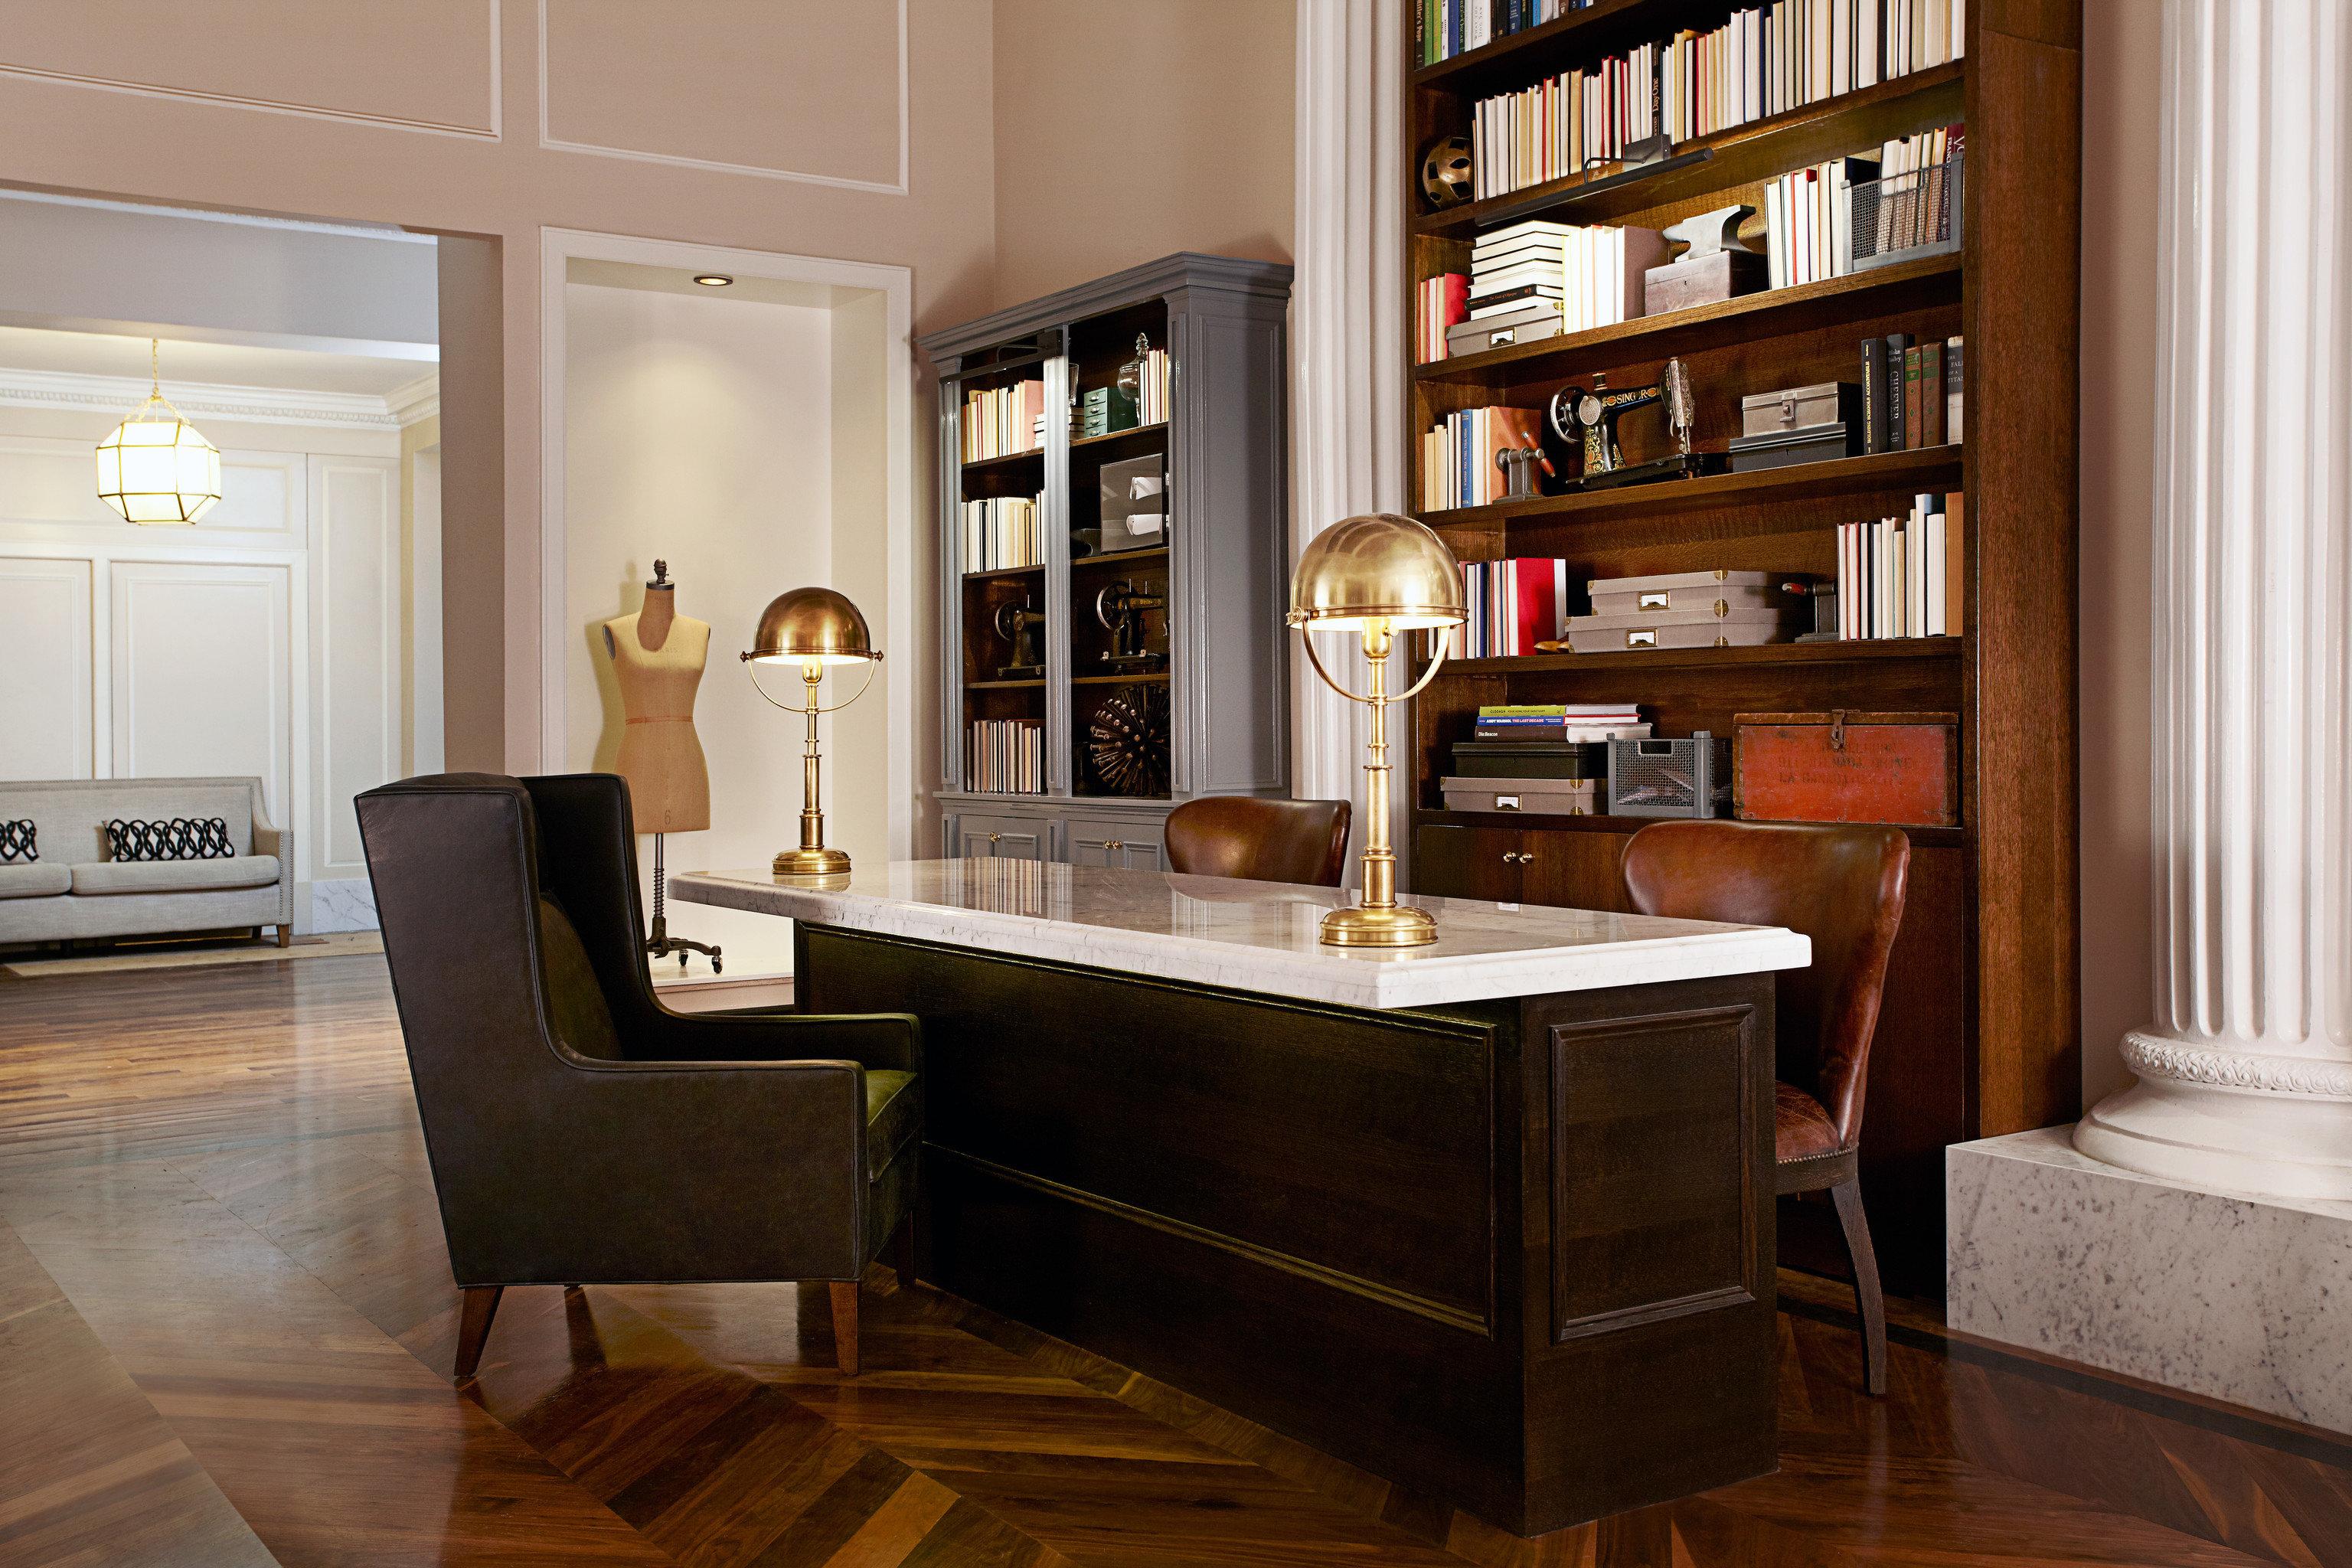 shelf property living room home cabinetry hardwood wood flooring flooring